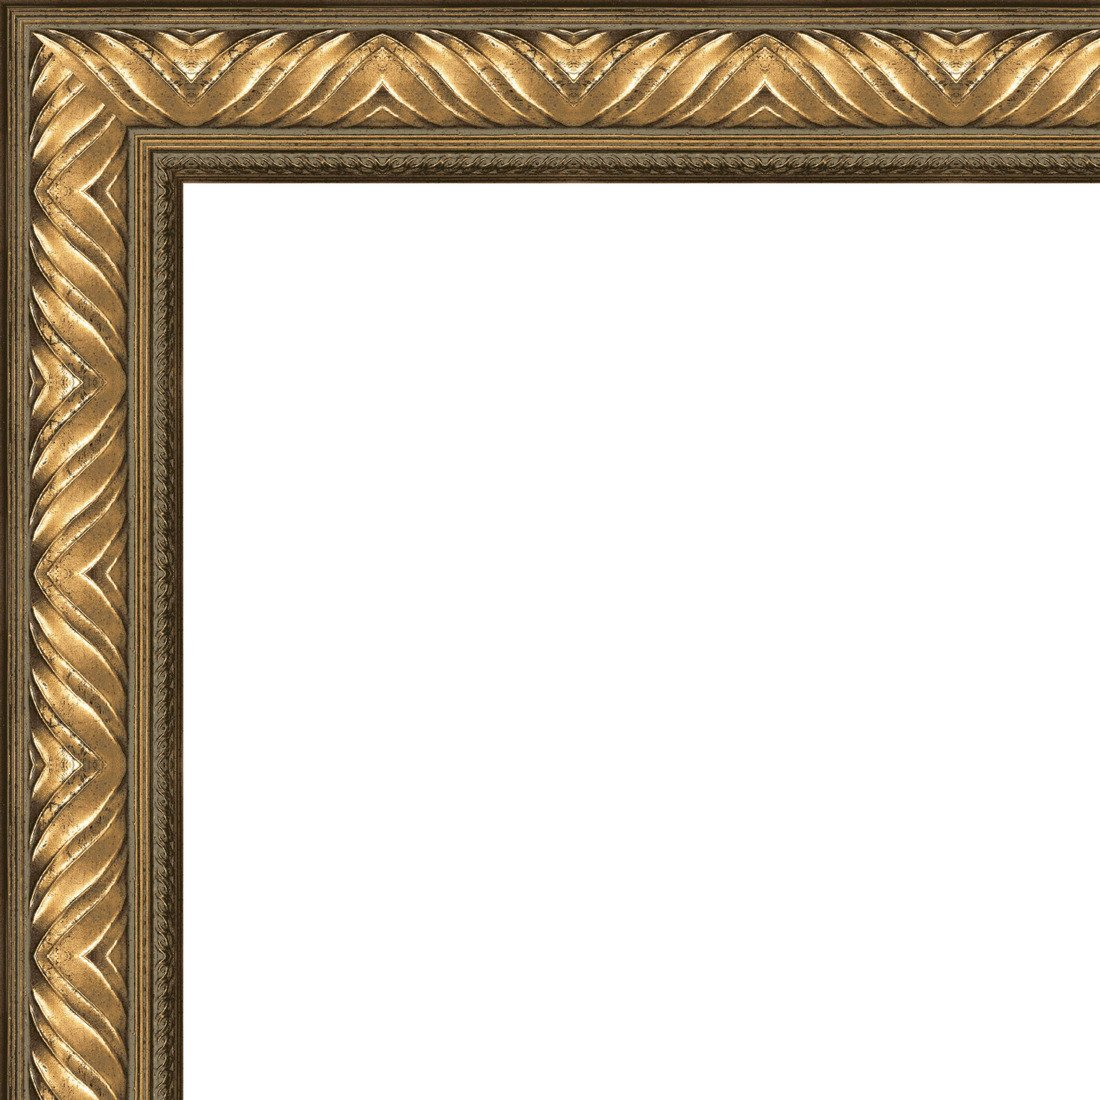 Picture Frame Moulding (Wood) 18ft bundle - Traditional Antique Gold Finish - 2.5'' width - 11/16'' rabbet depth by CustomPictureFrames